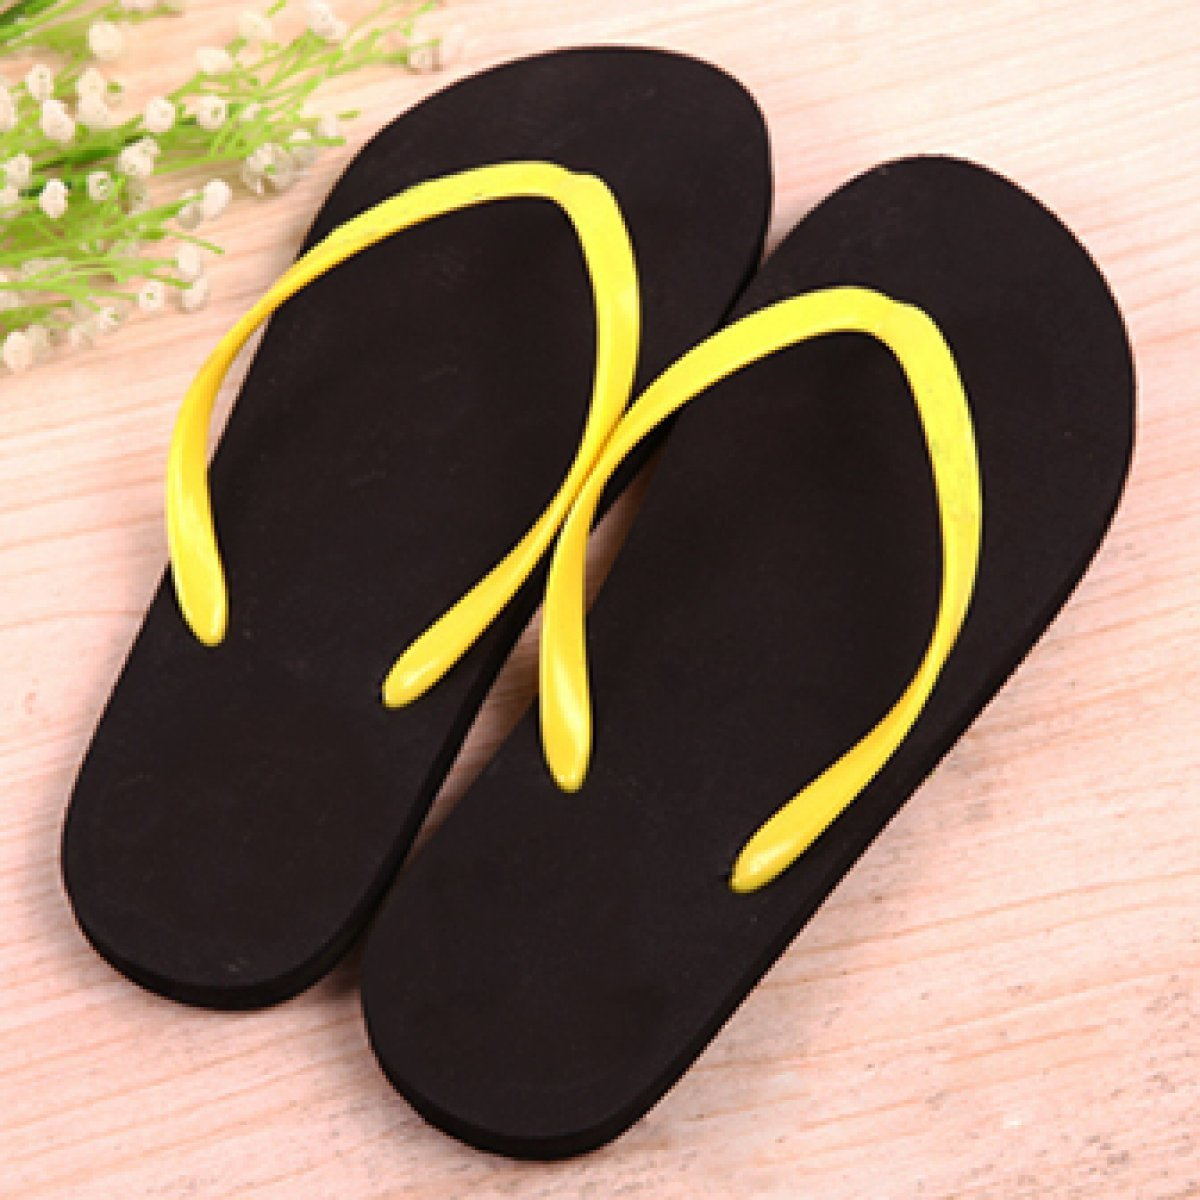 39a7ee7d4f8 Σαγιονάρες - Παπούτσια θαλάσσης   Mymegamarket